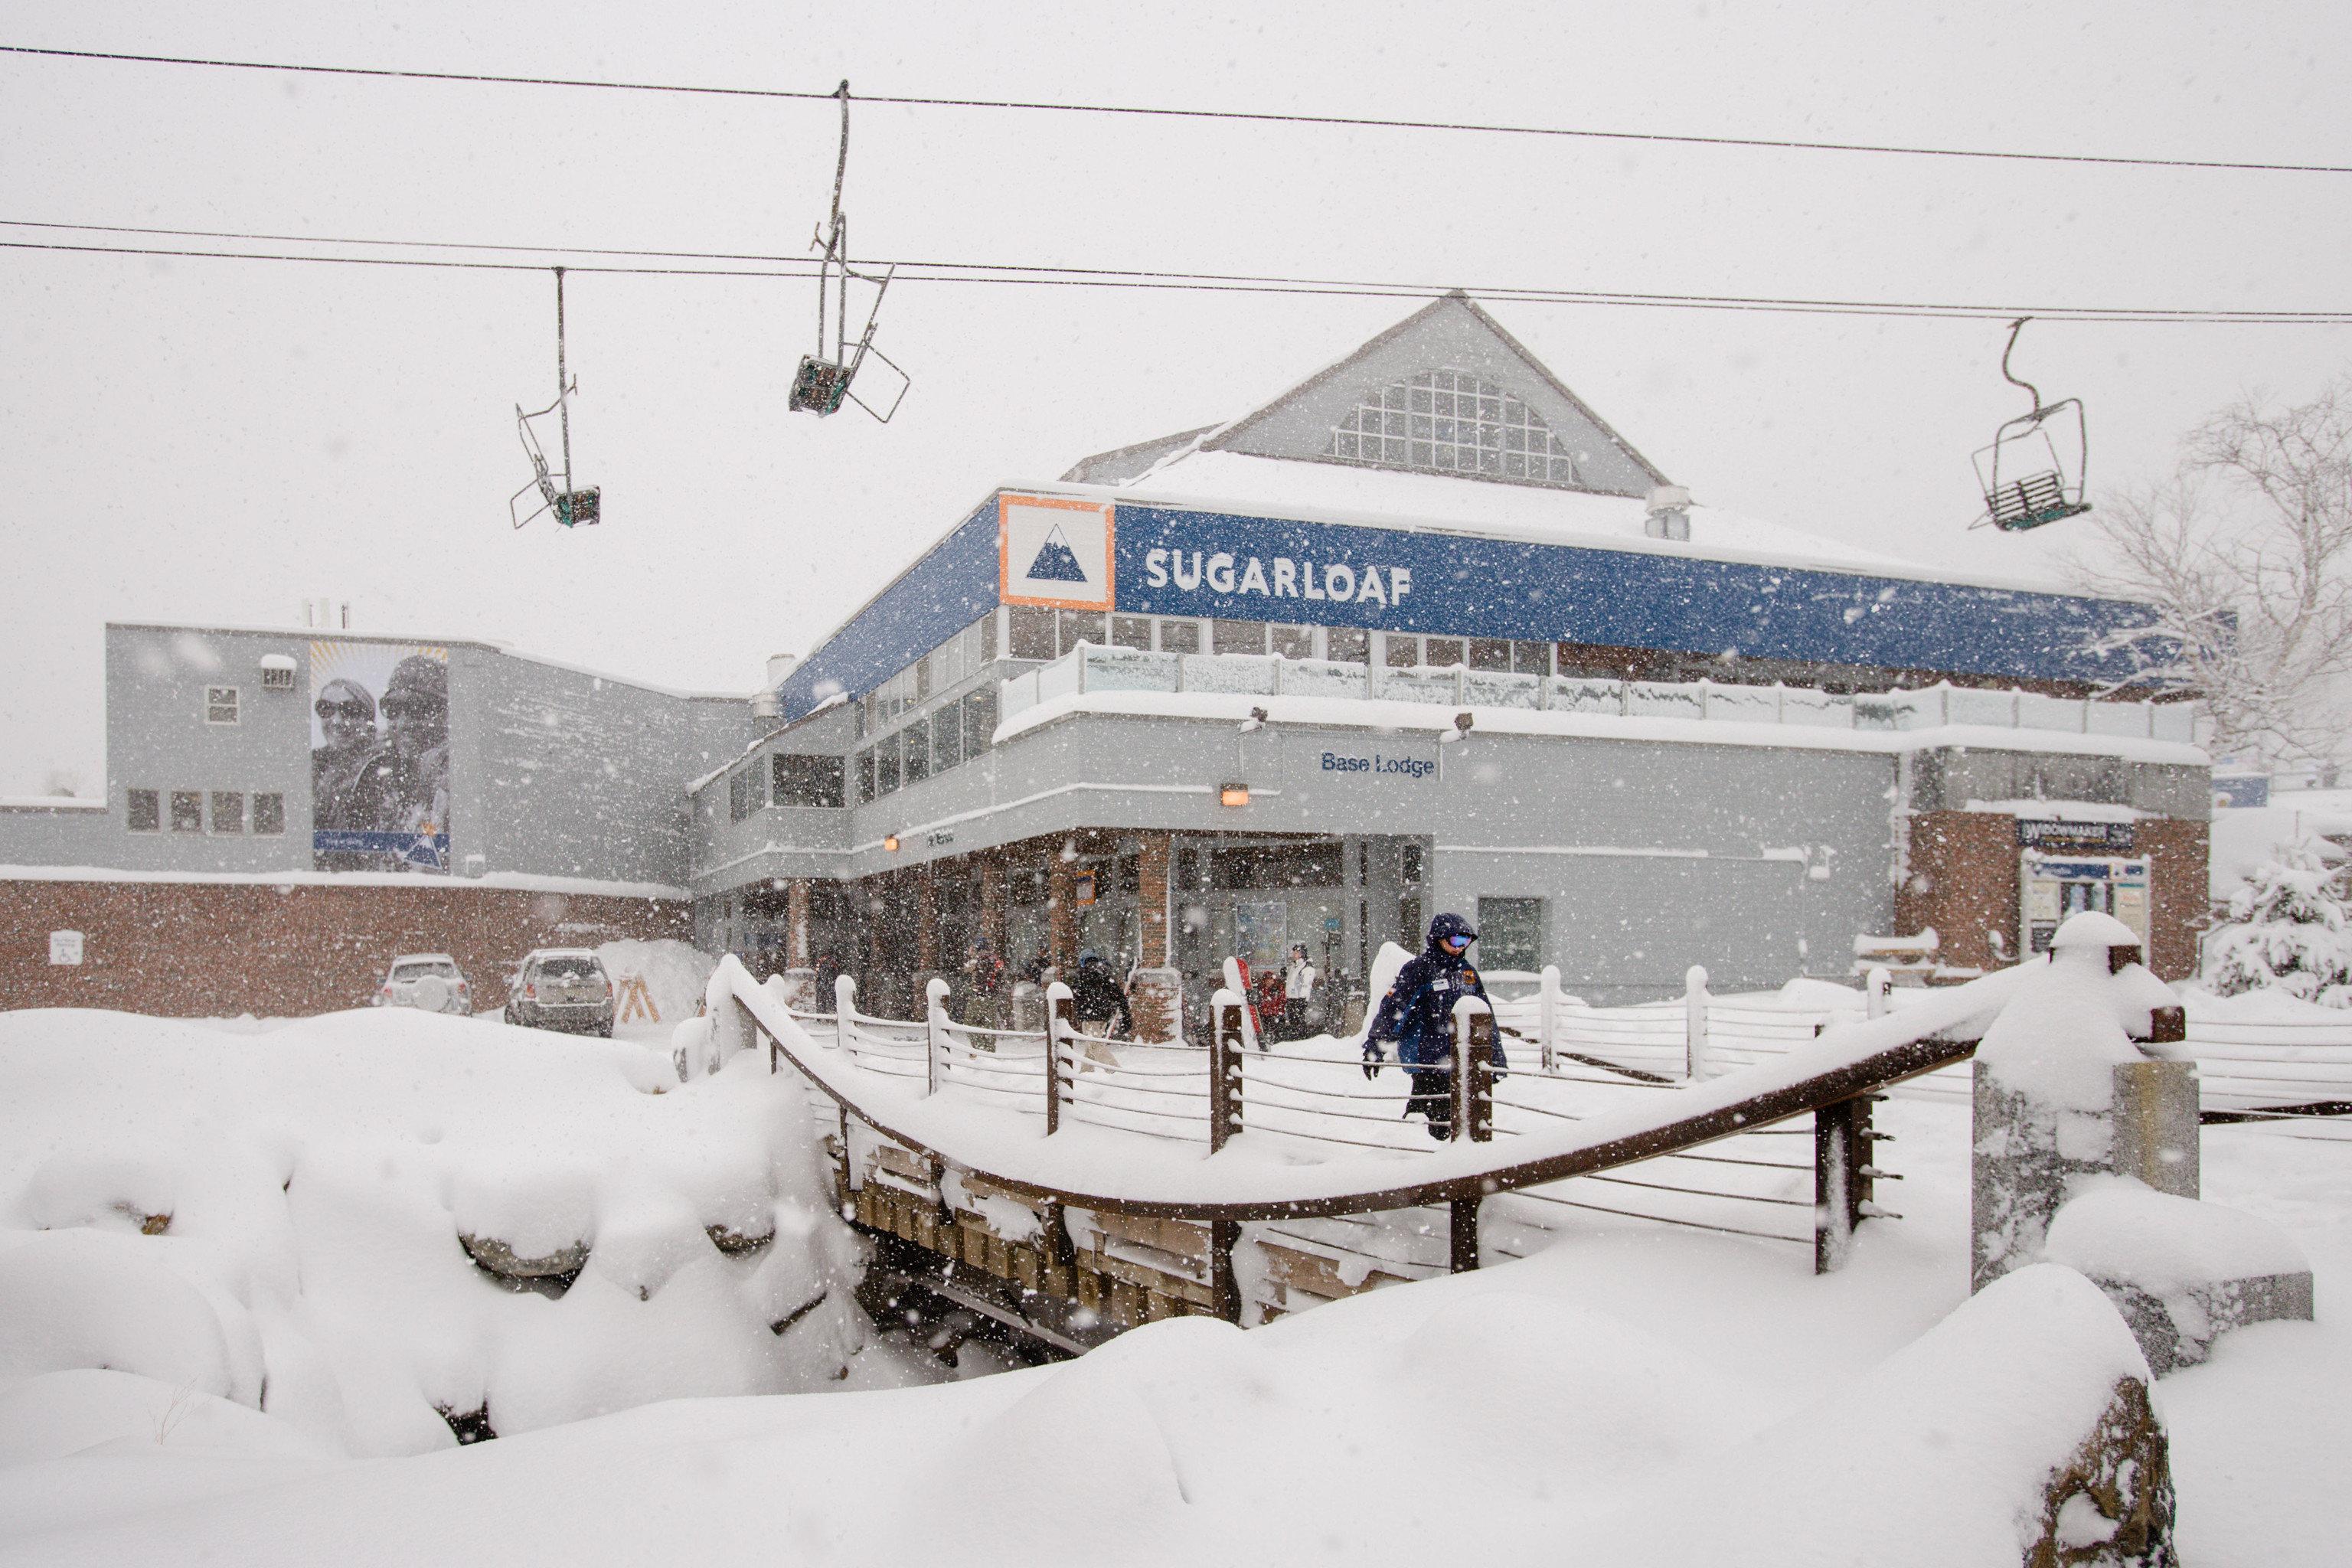 alpine skiing East Coast USA Trip Ideas snow skiing outdoor Winter Nature ski tow freezing covered geological phenomenon arctic blizzard winter storm slope ice ski slope